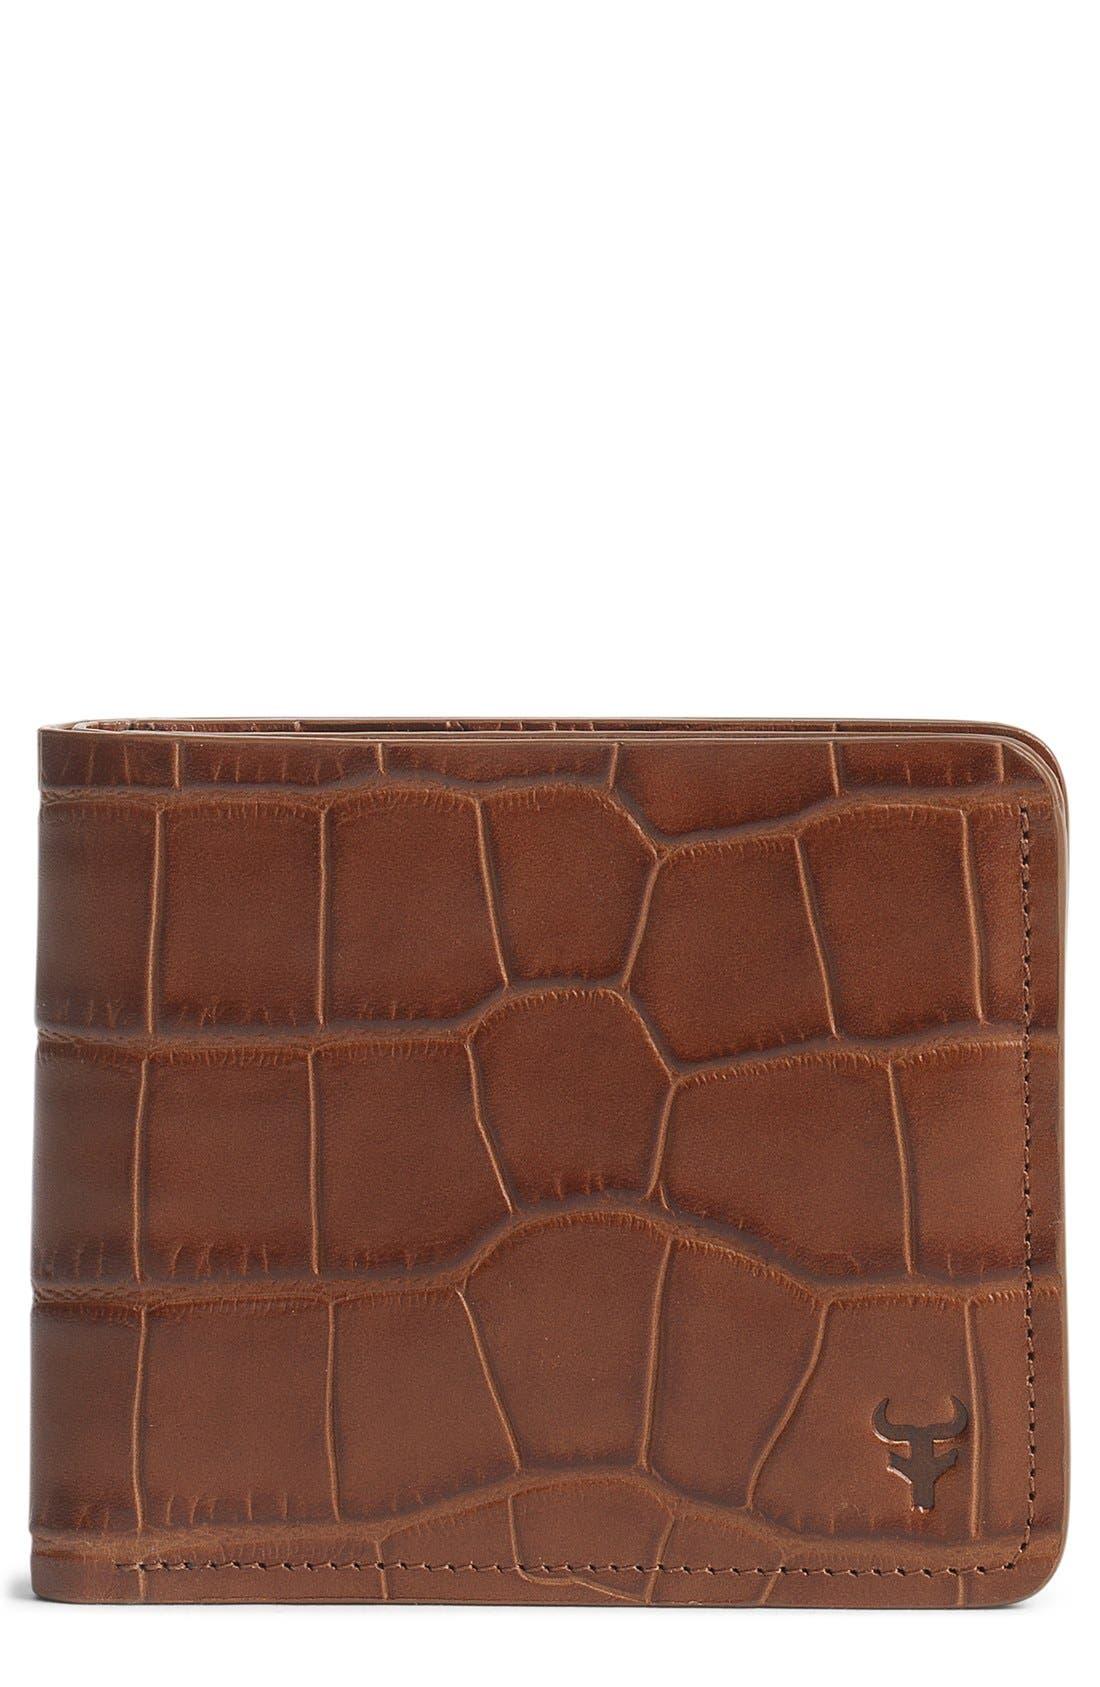 TRASK Jackson Slimfold Embossed Leather Wallet